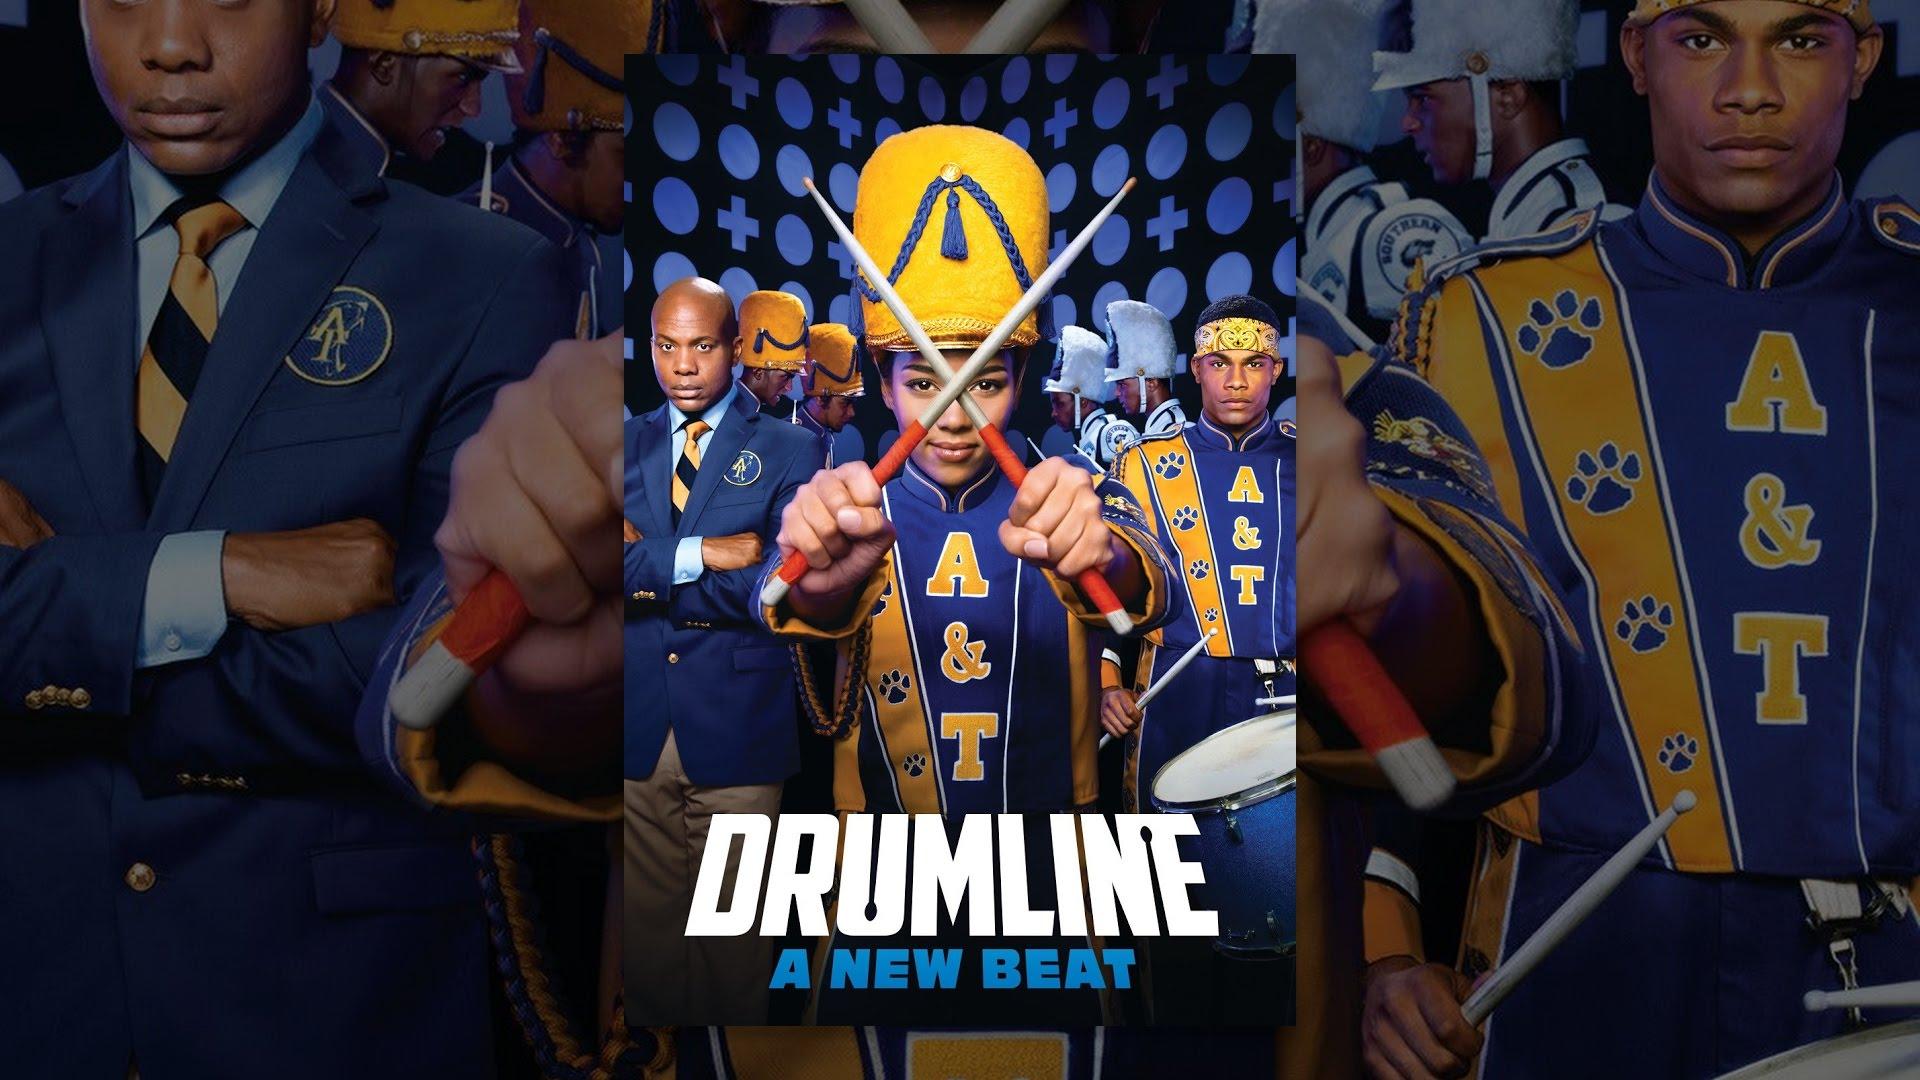 Download Drumline: a New Beat